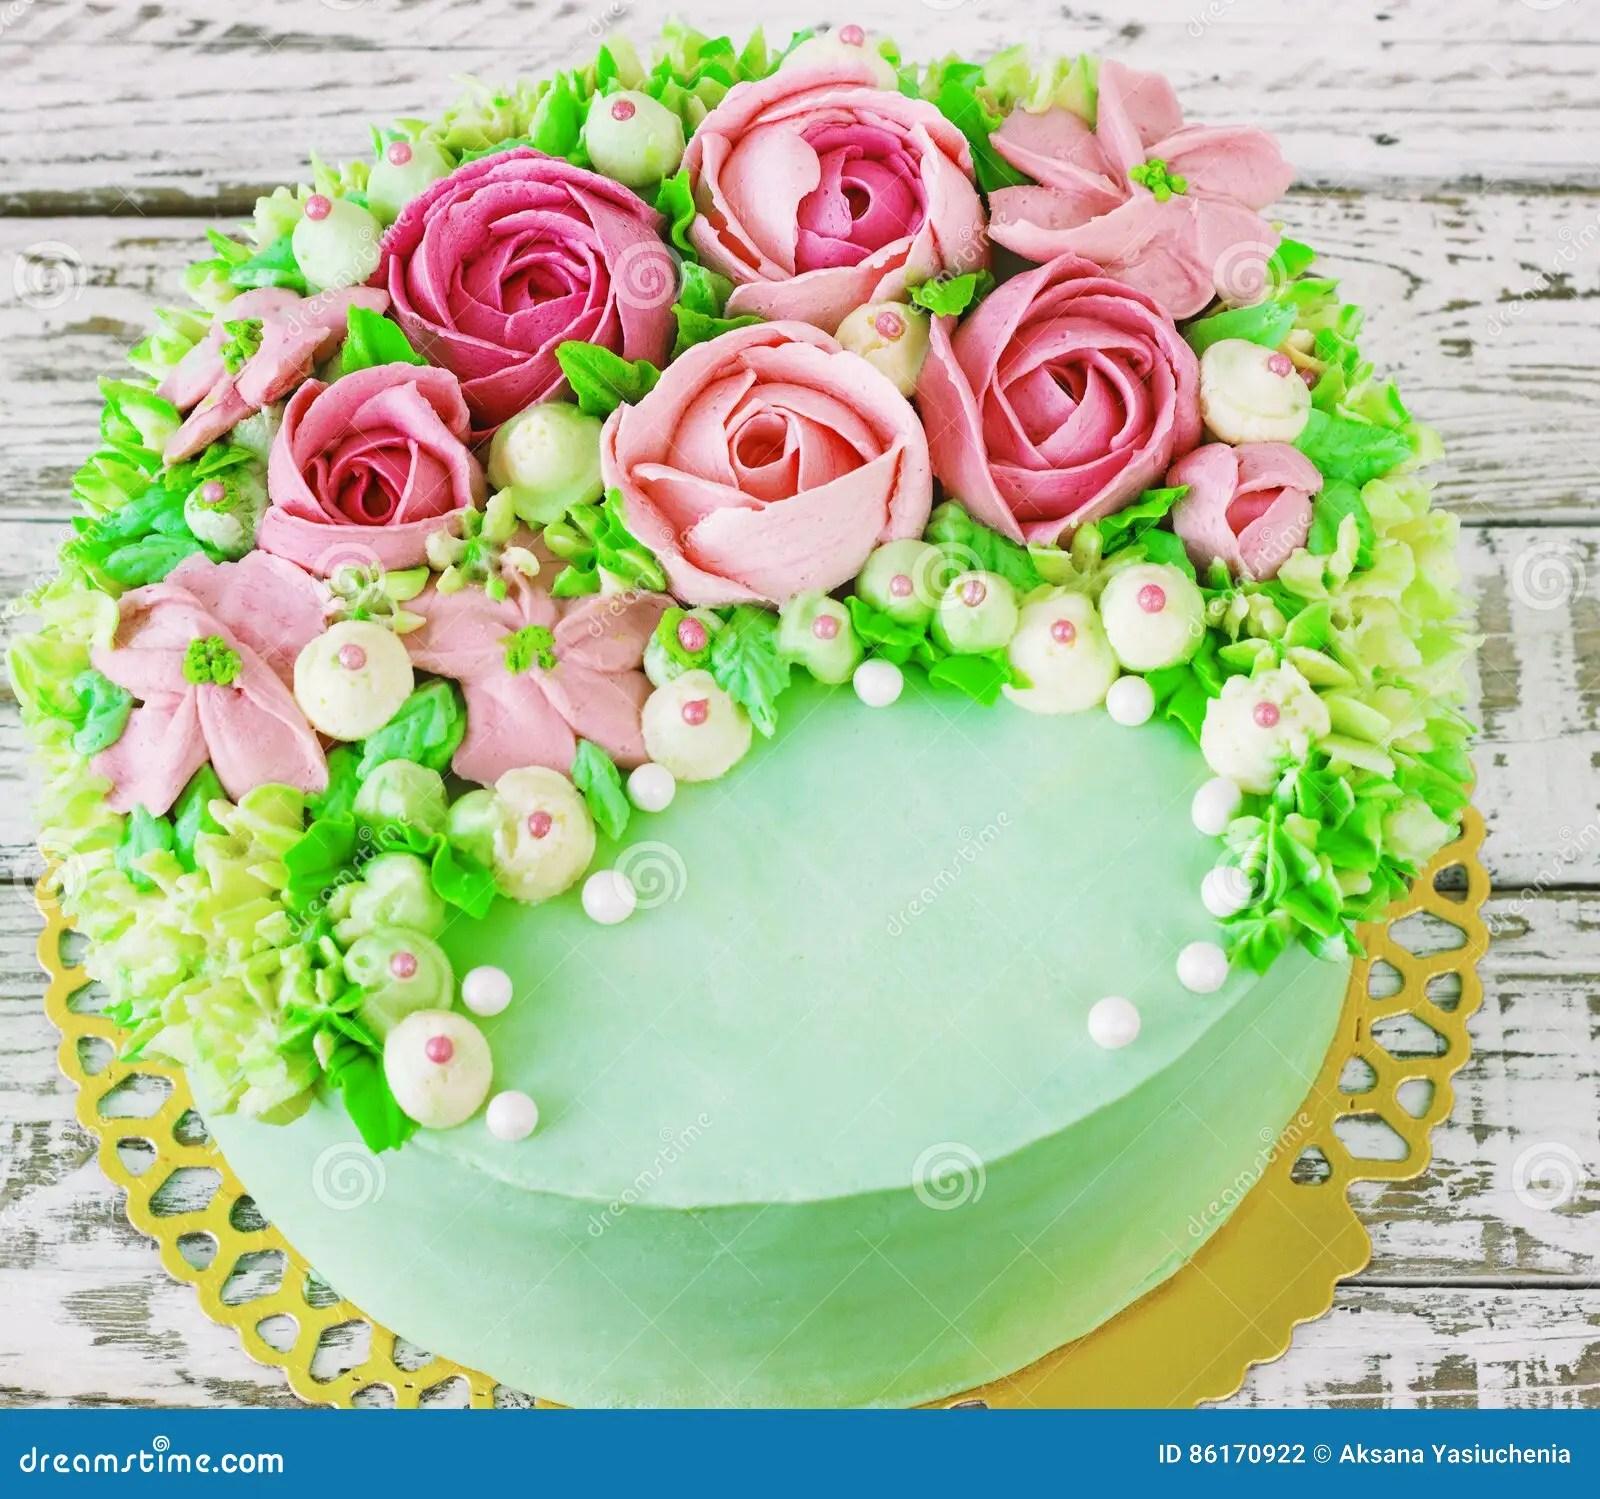 Background With Birthday Cake Cartoon Vector